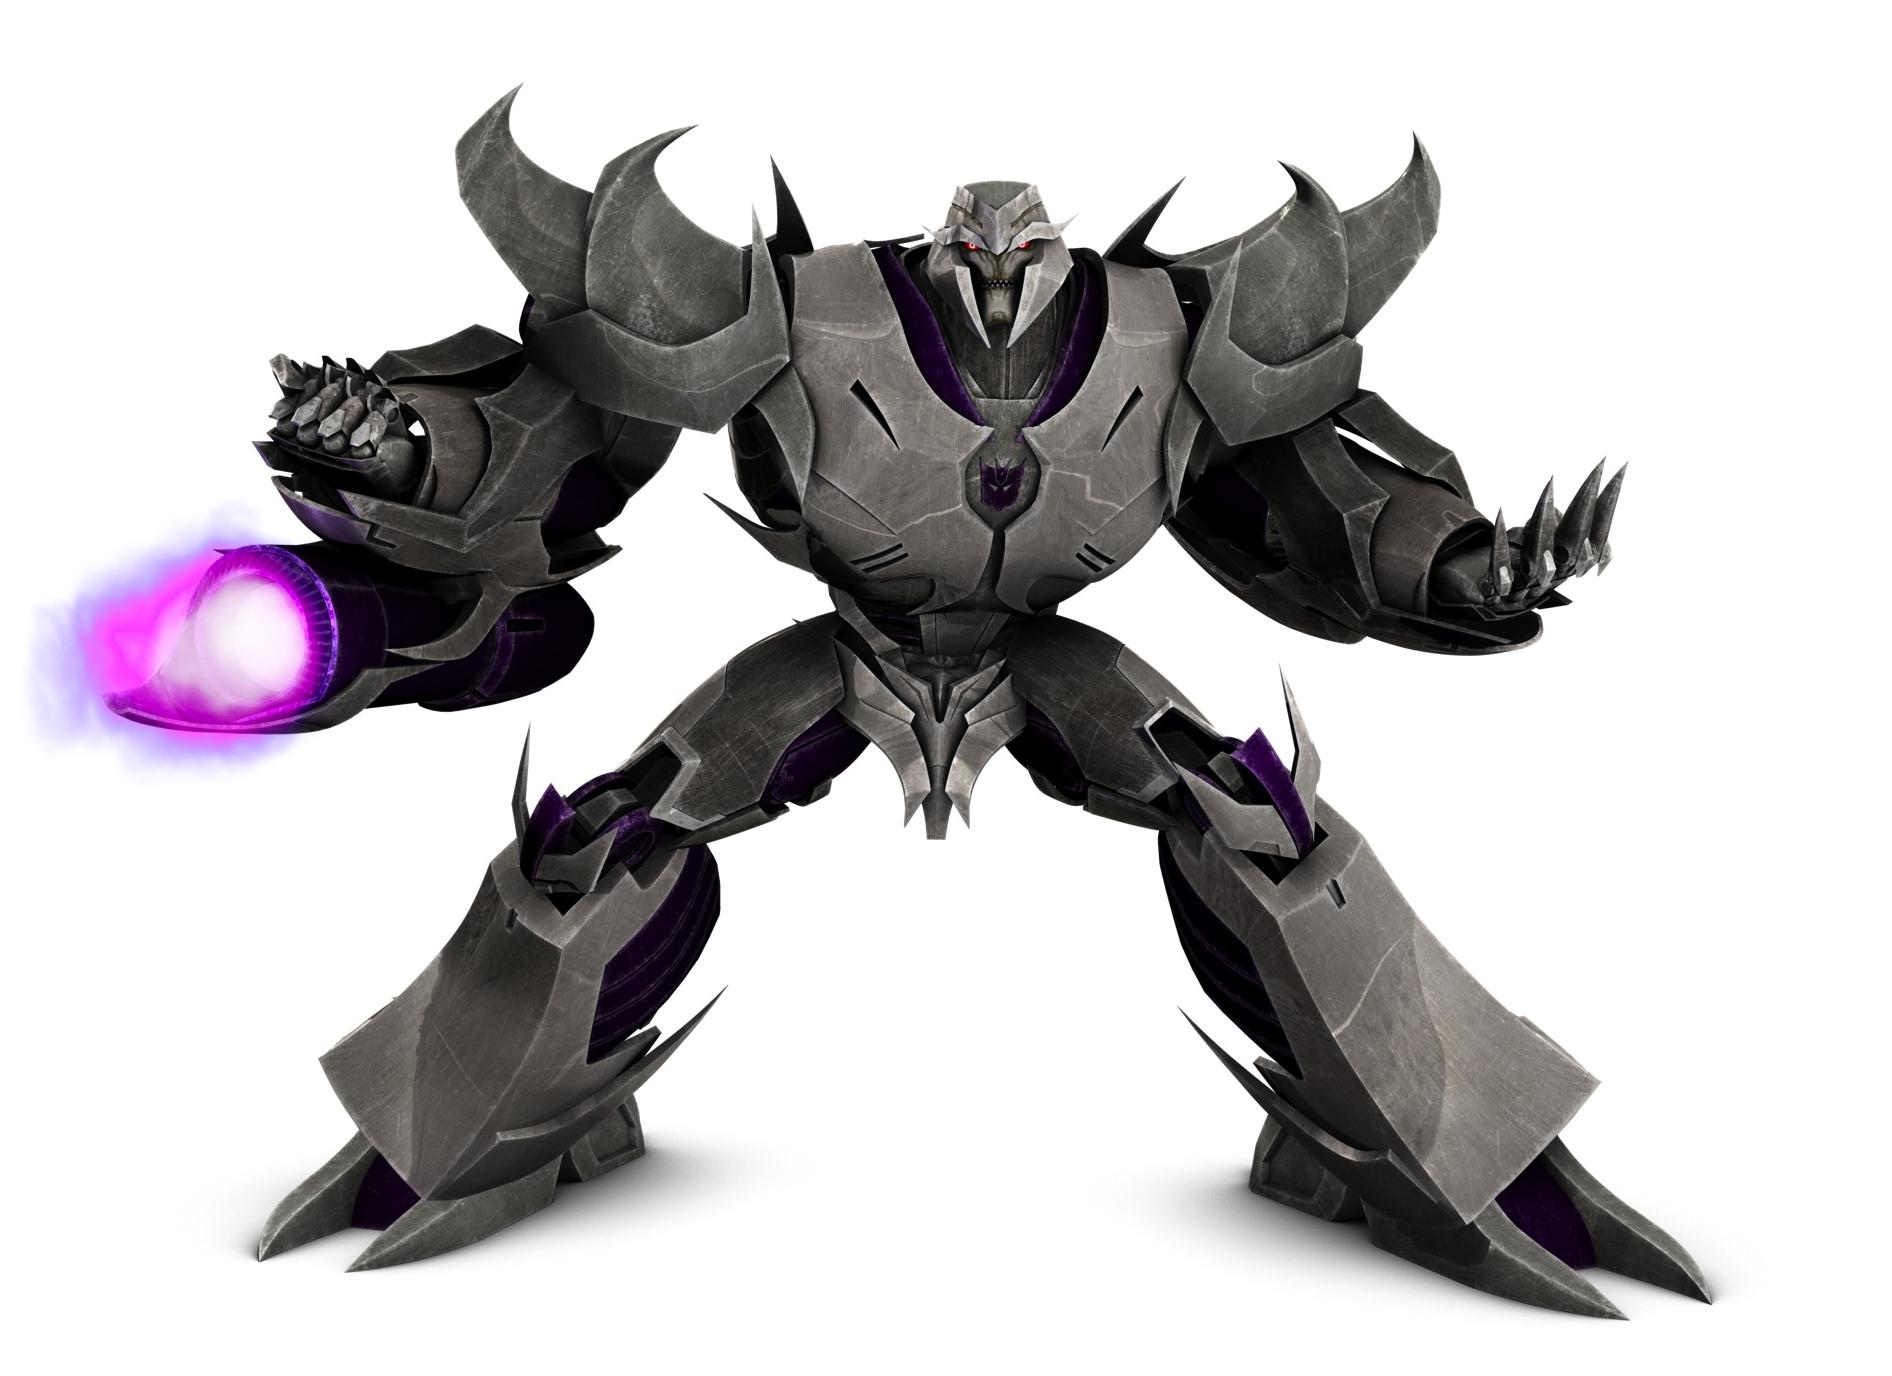 Image alien wiki fandom powered by wikia - Transformers prime megatron ...